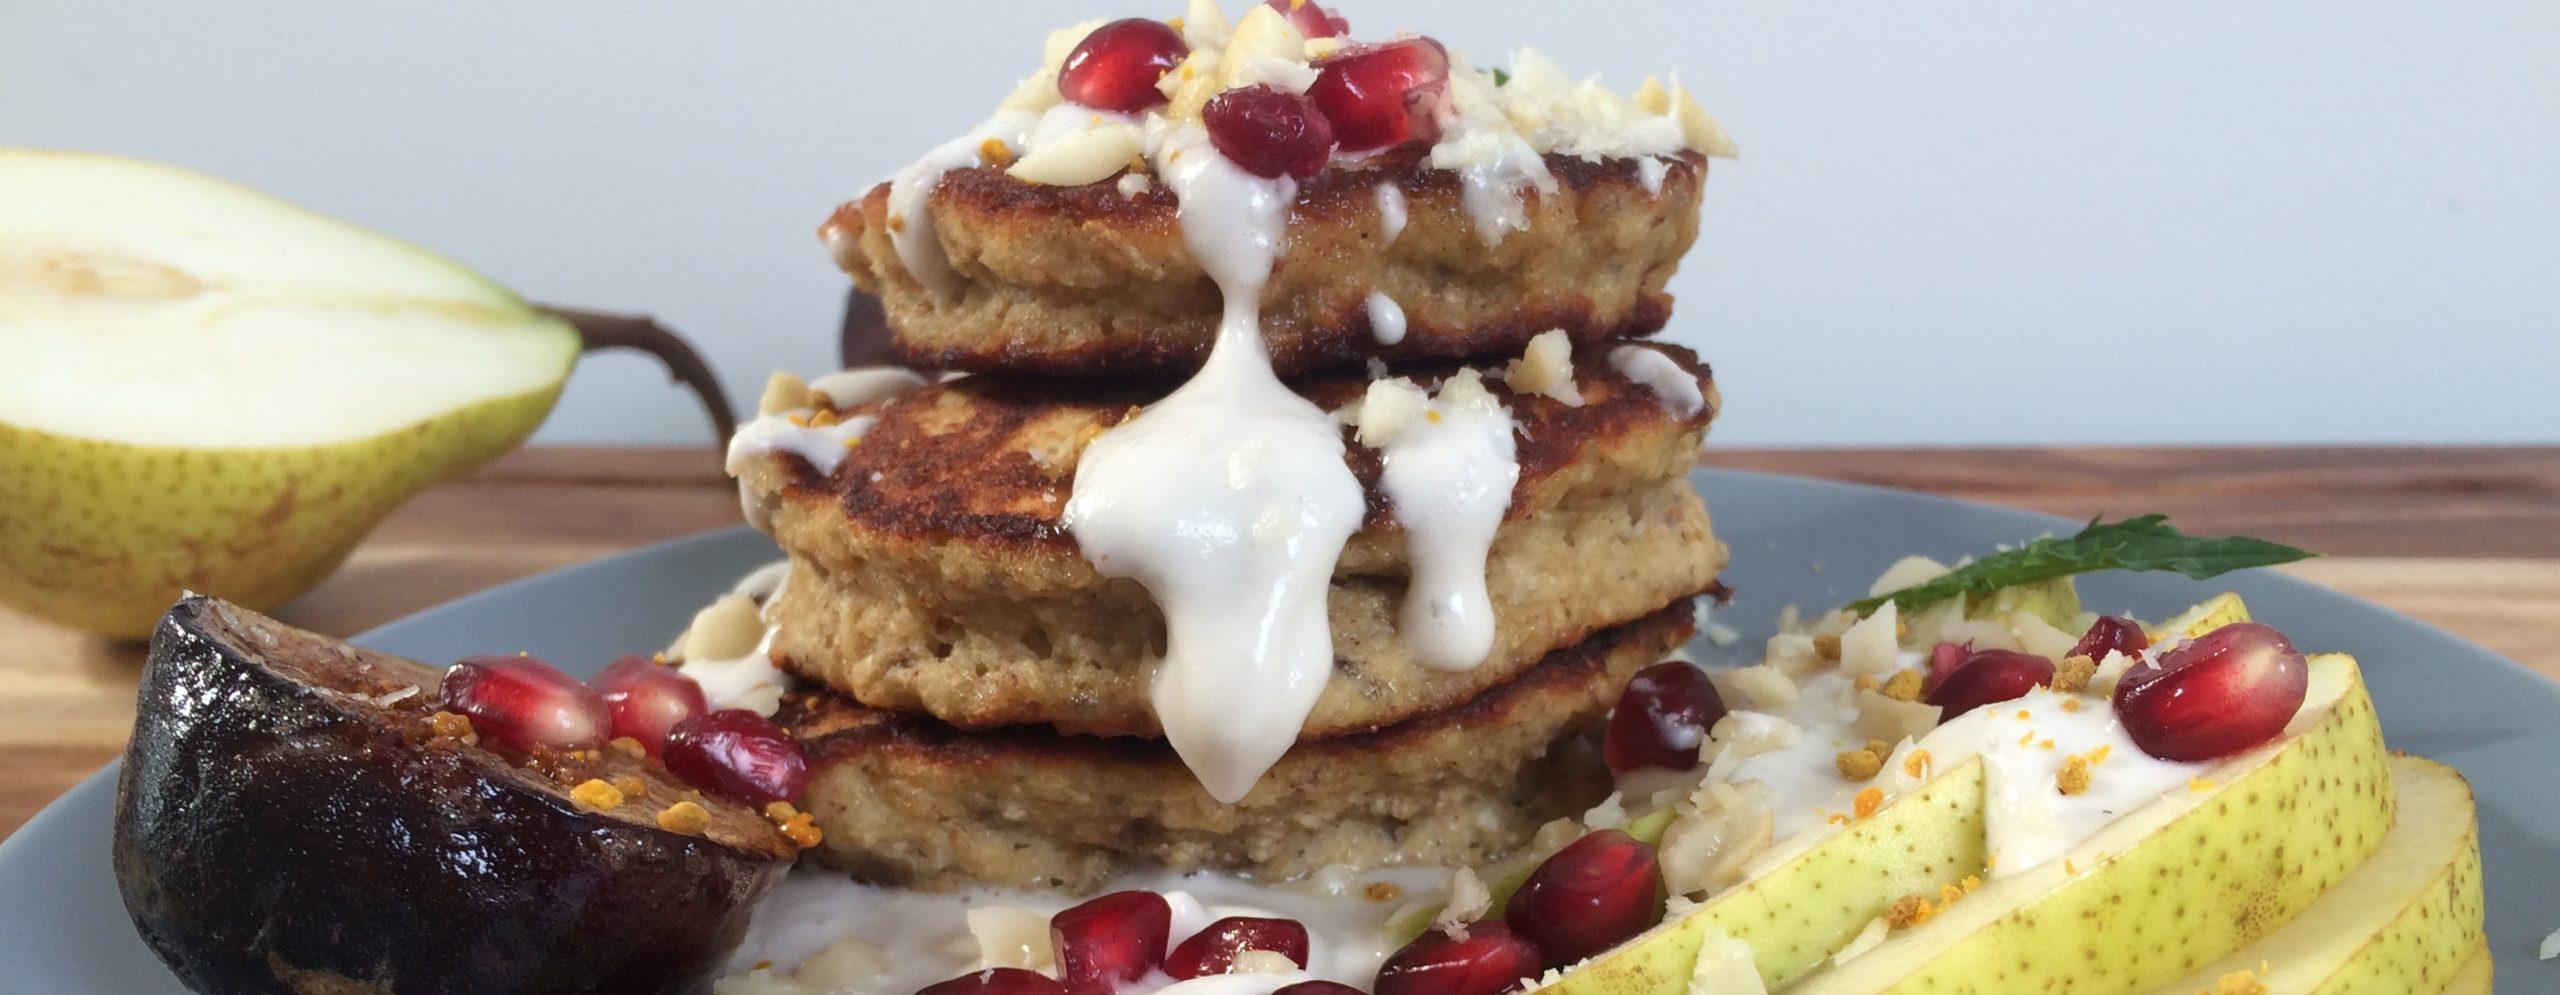 Chia & Buckwheat Banana Pancakes